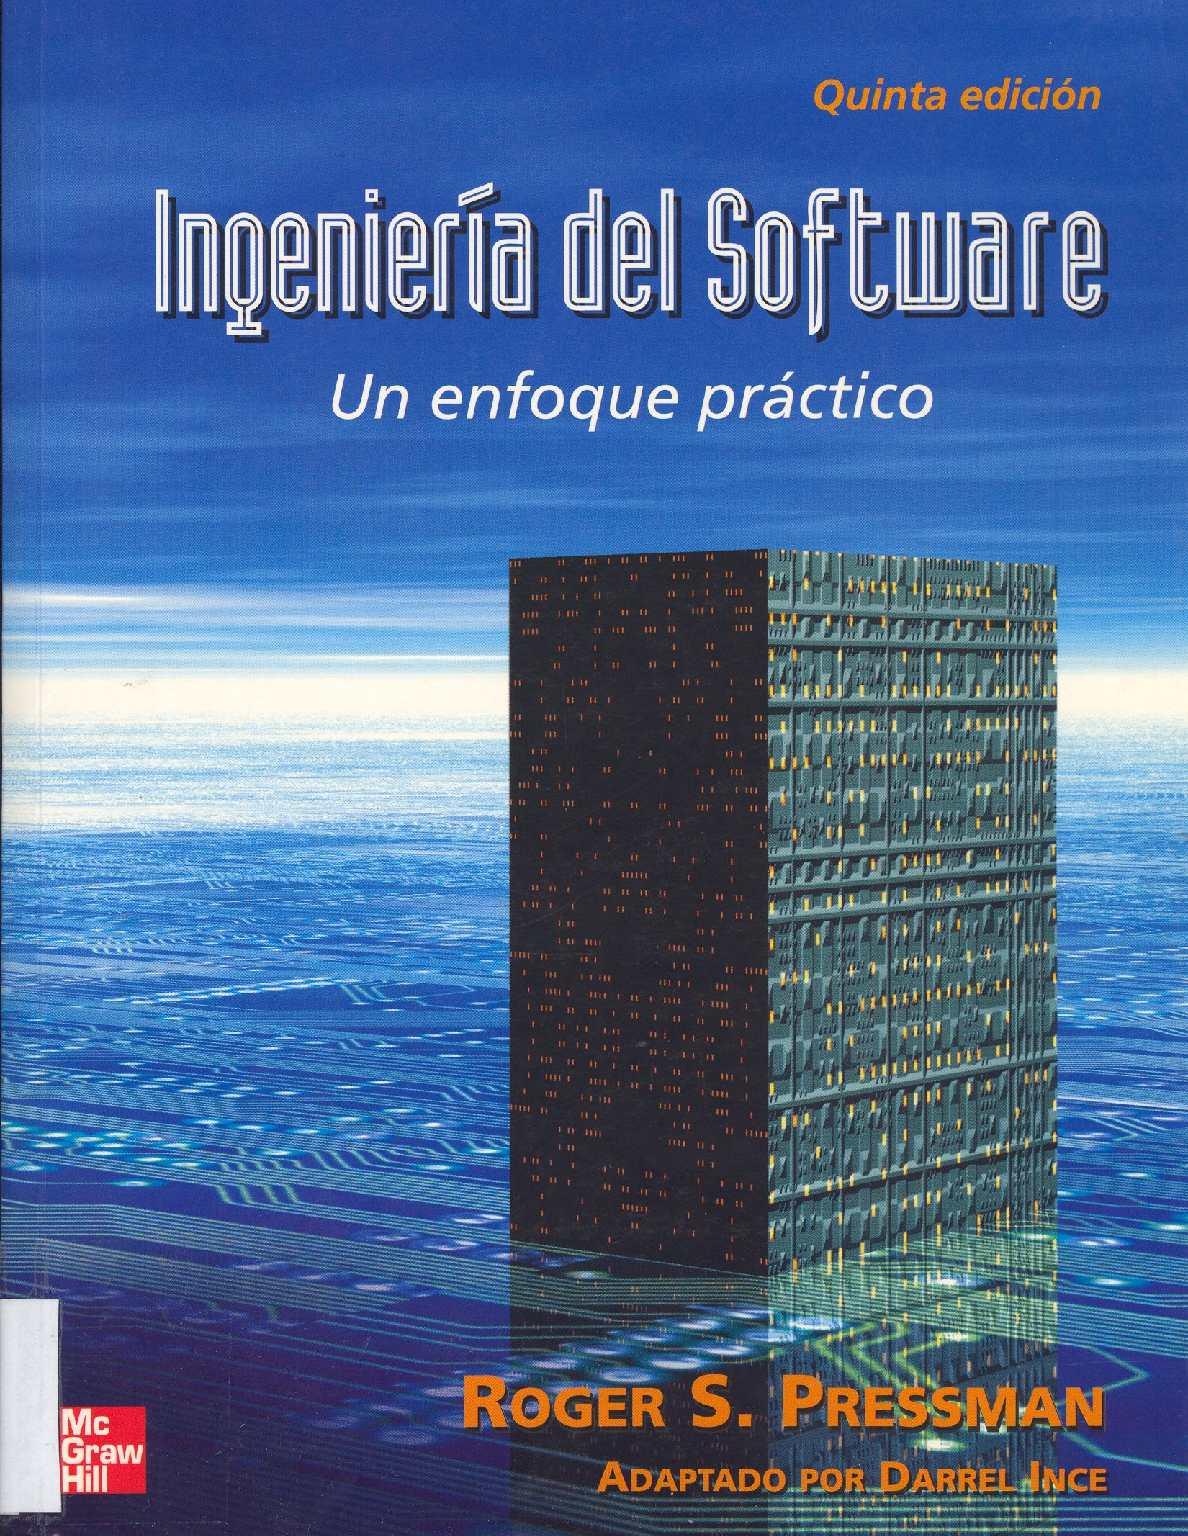 Calaméo - Ingeniería de Software, Roger S. Pressman - photo#44